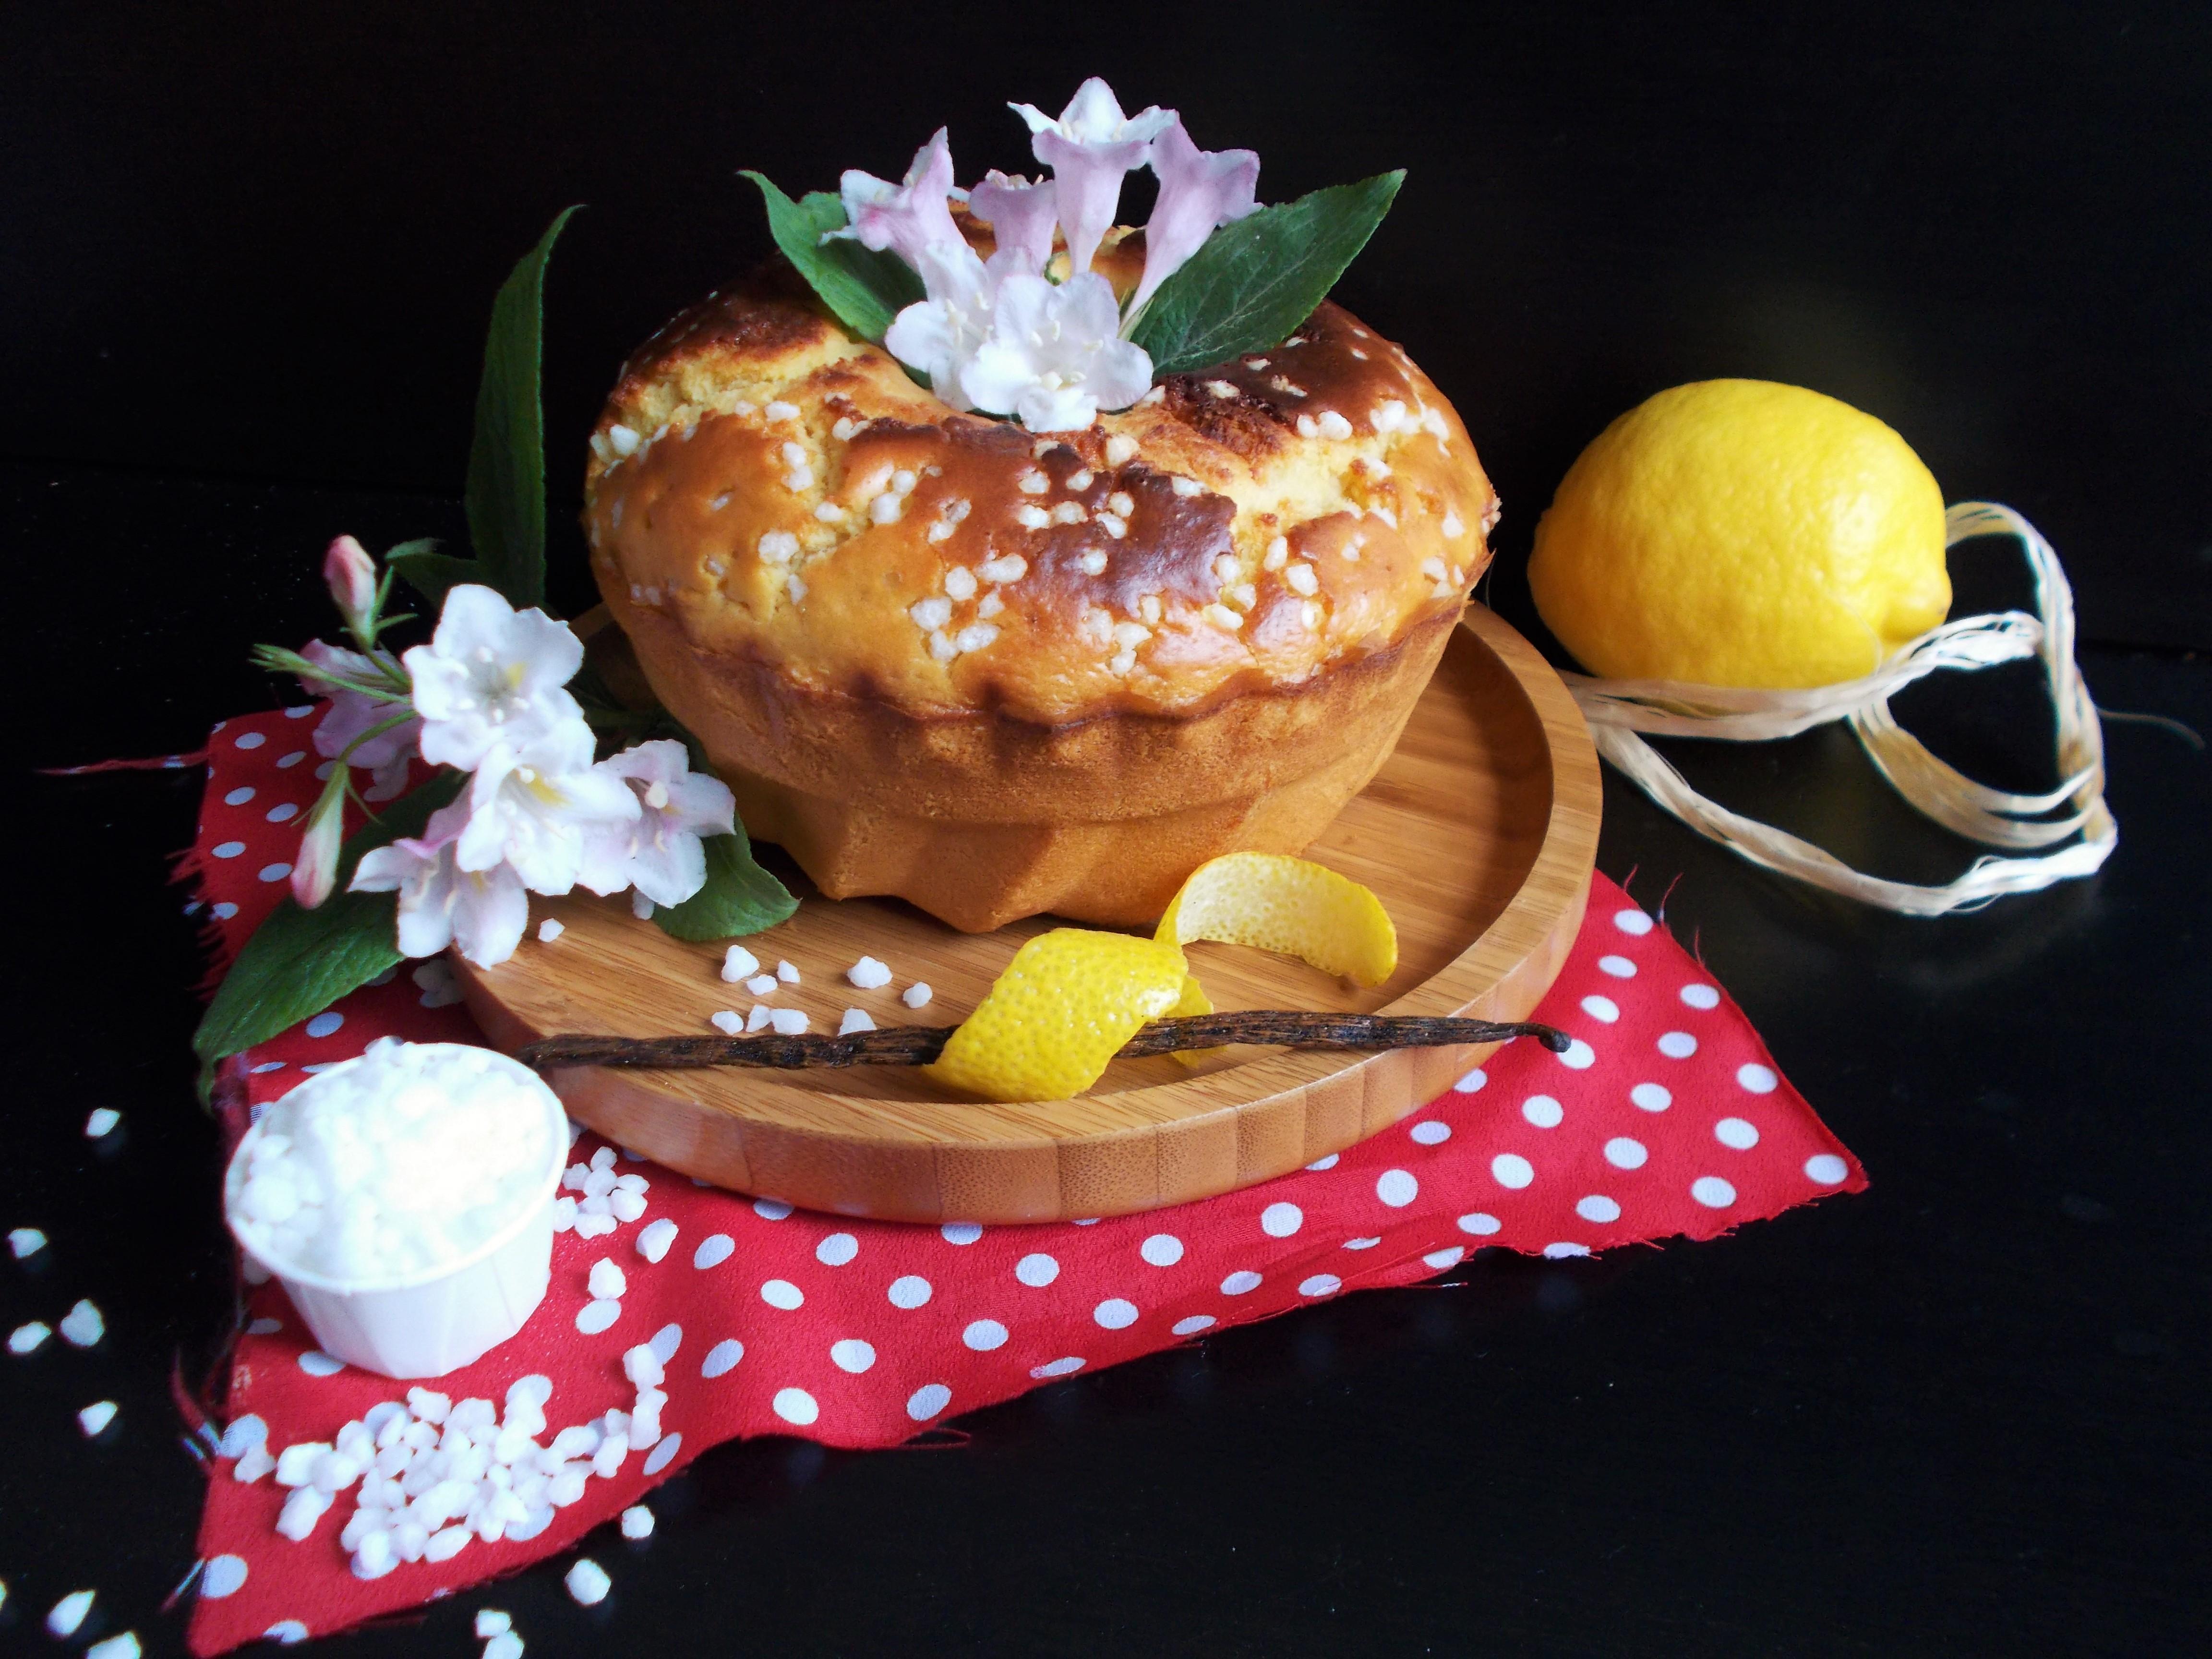 Pastis Landais : version brioche rhum-vanille-fleur d'oranger